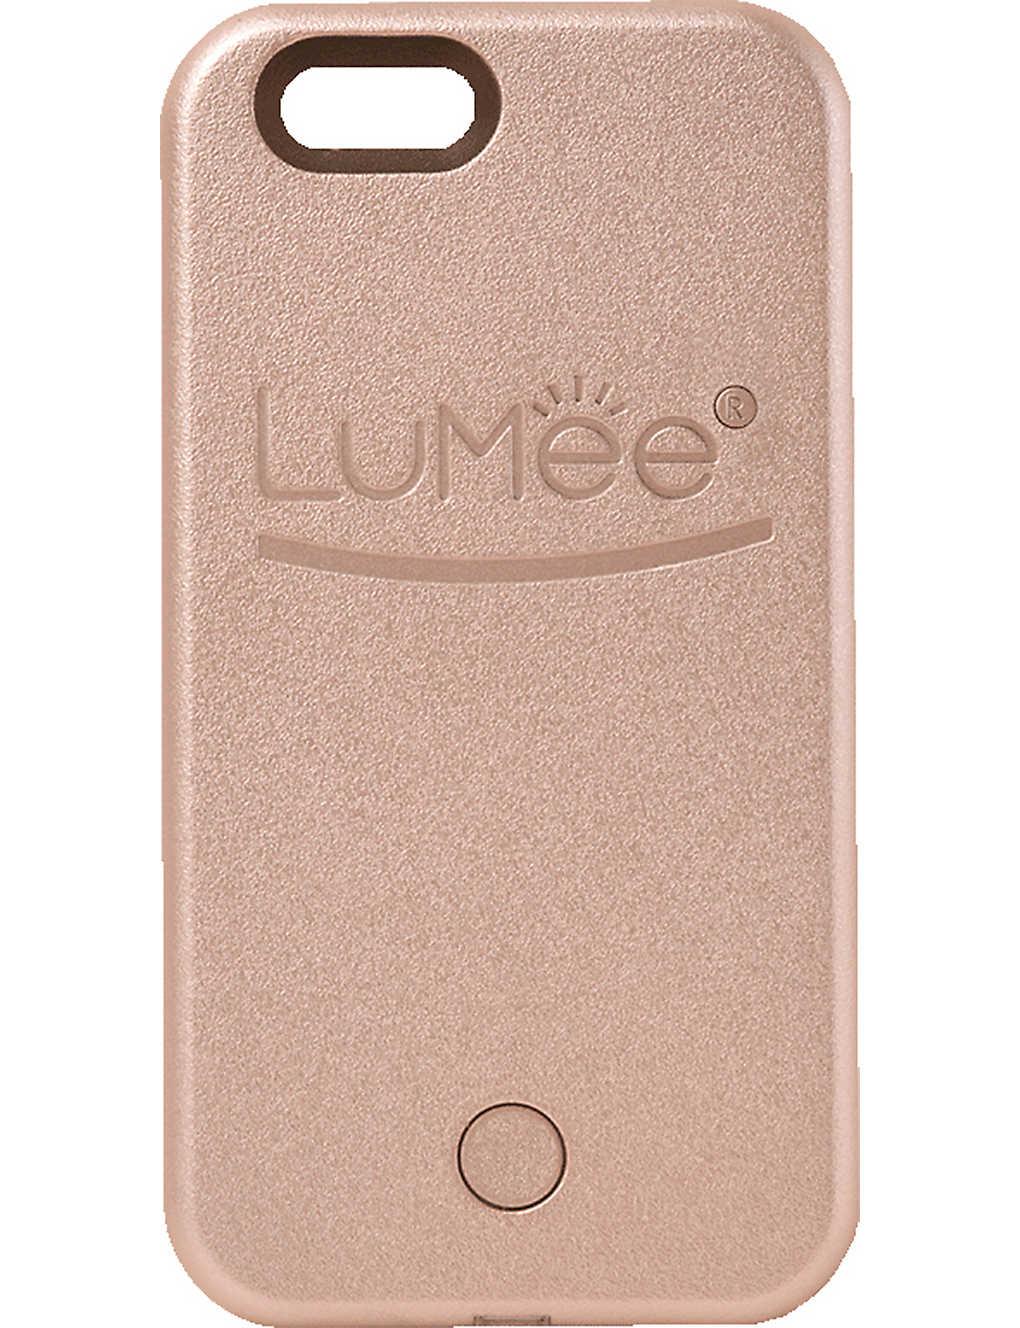 newest 9be2b 20410 LUMEE - Lighted selfie iPhone 6 phone case | Selfridges.com